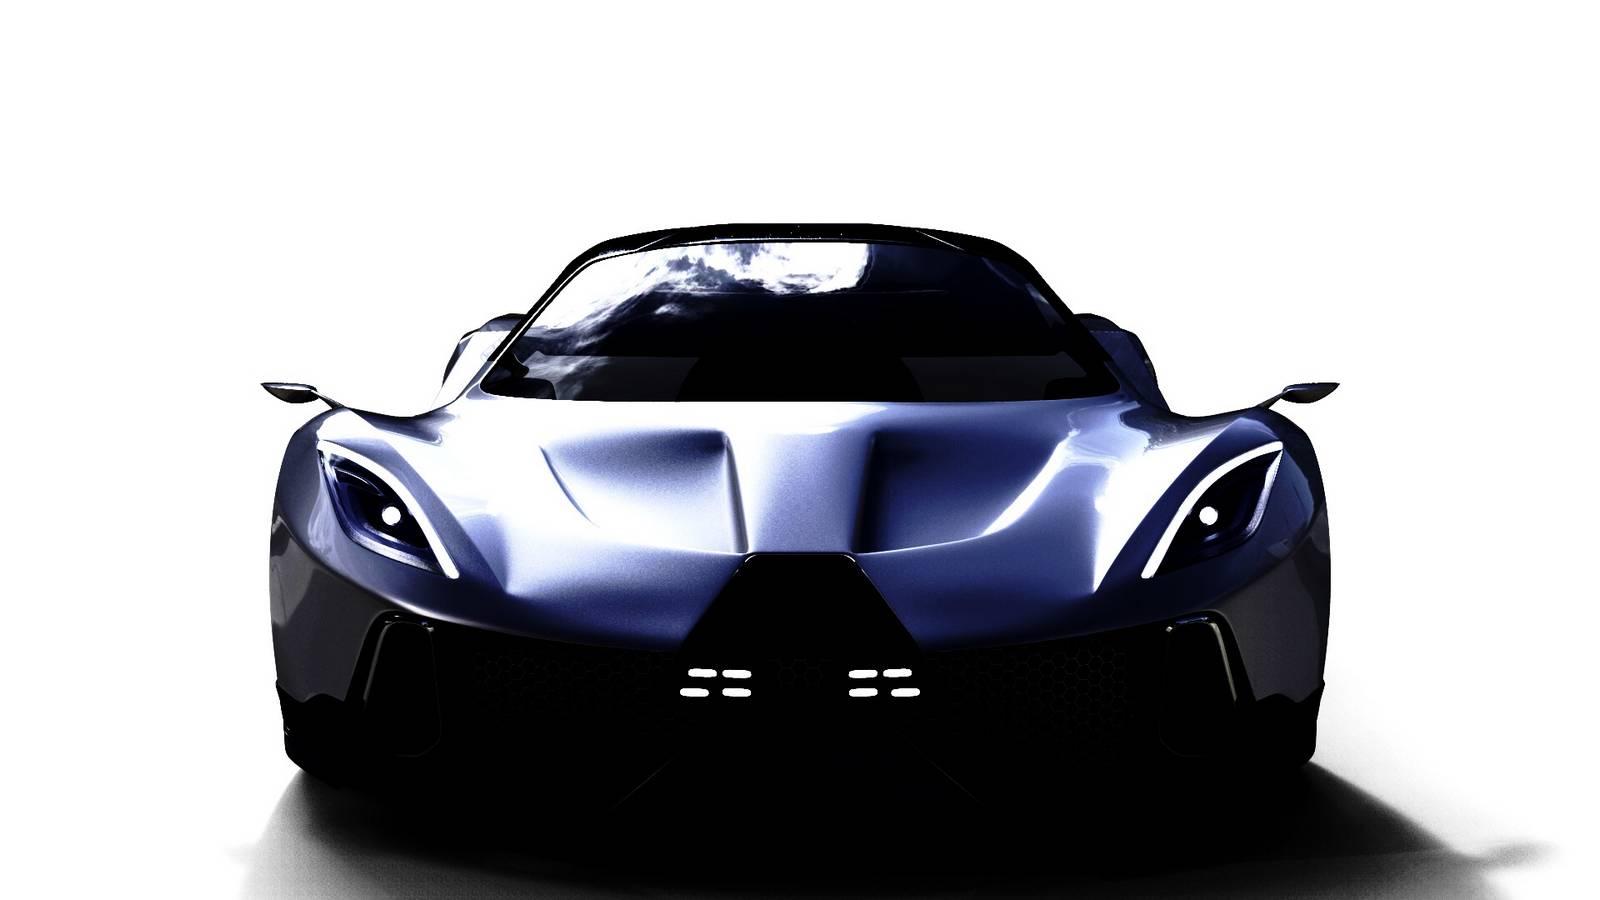 PSC Motors Teases 1700hp Hybrid Supercar - GTspirit